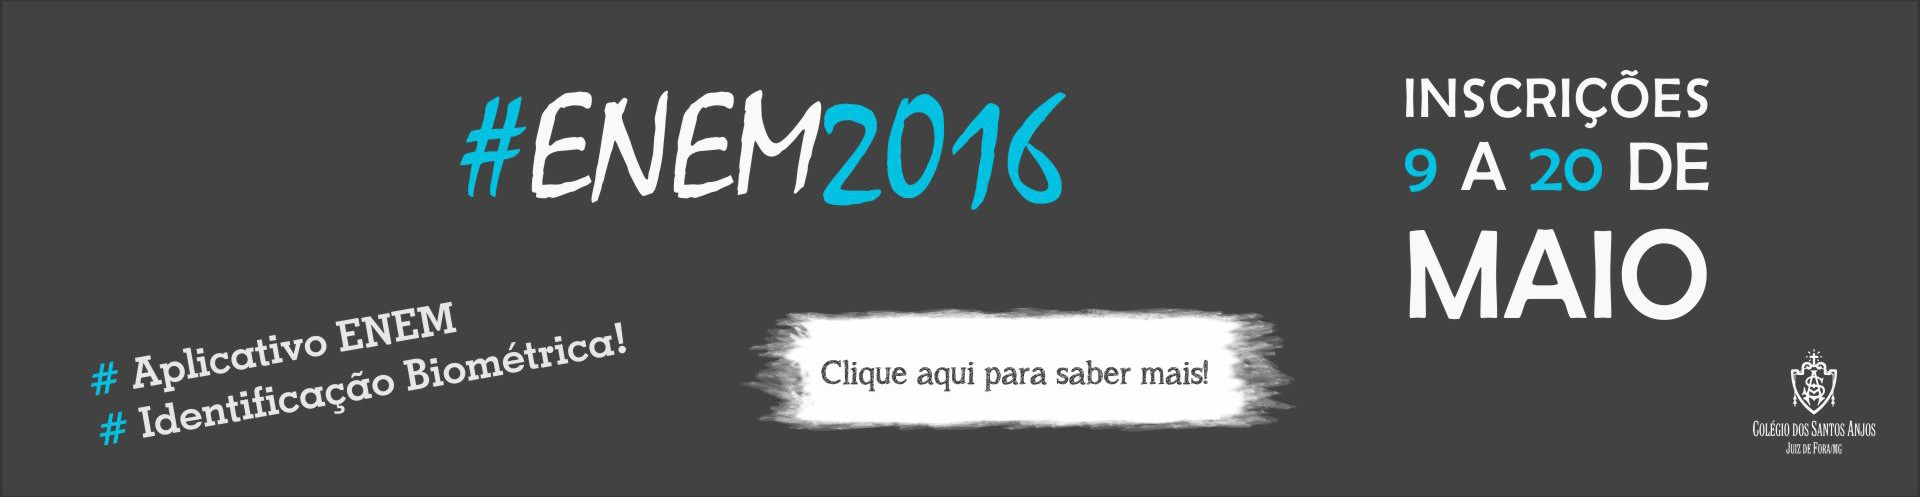 20160415_ENEM_banner